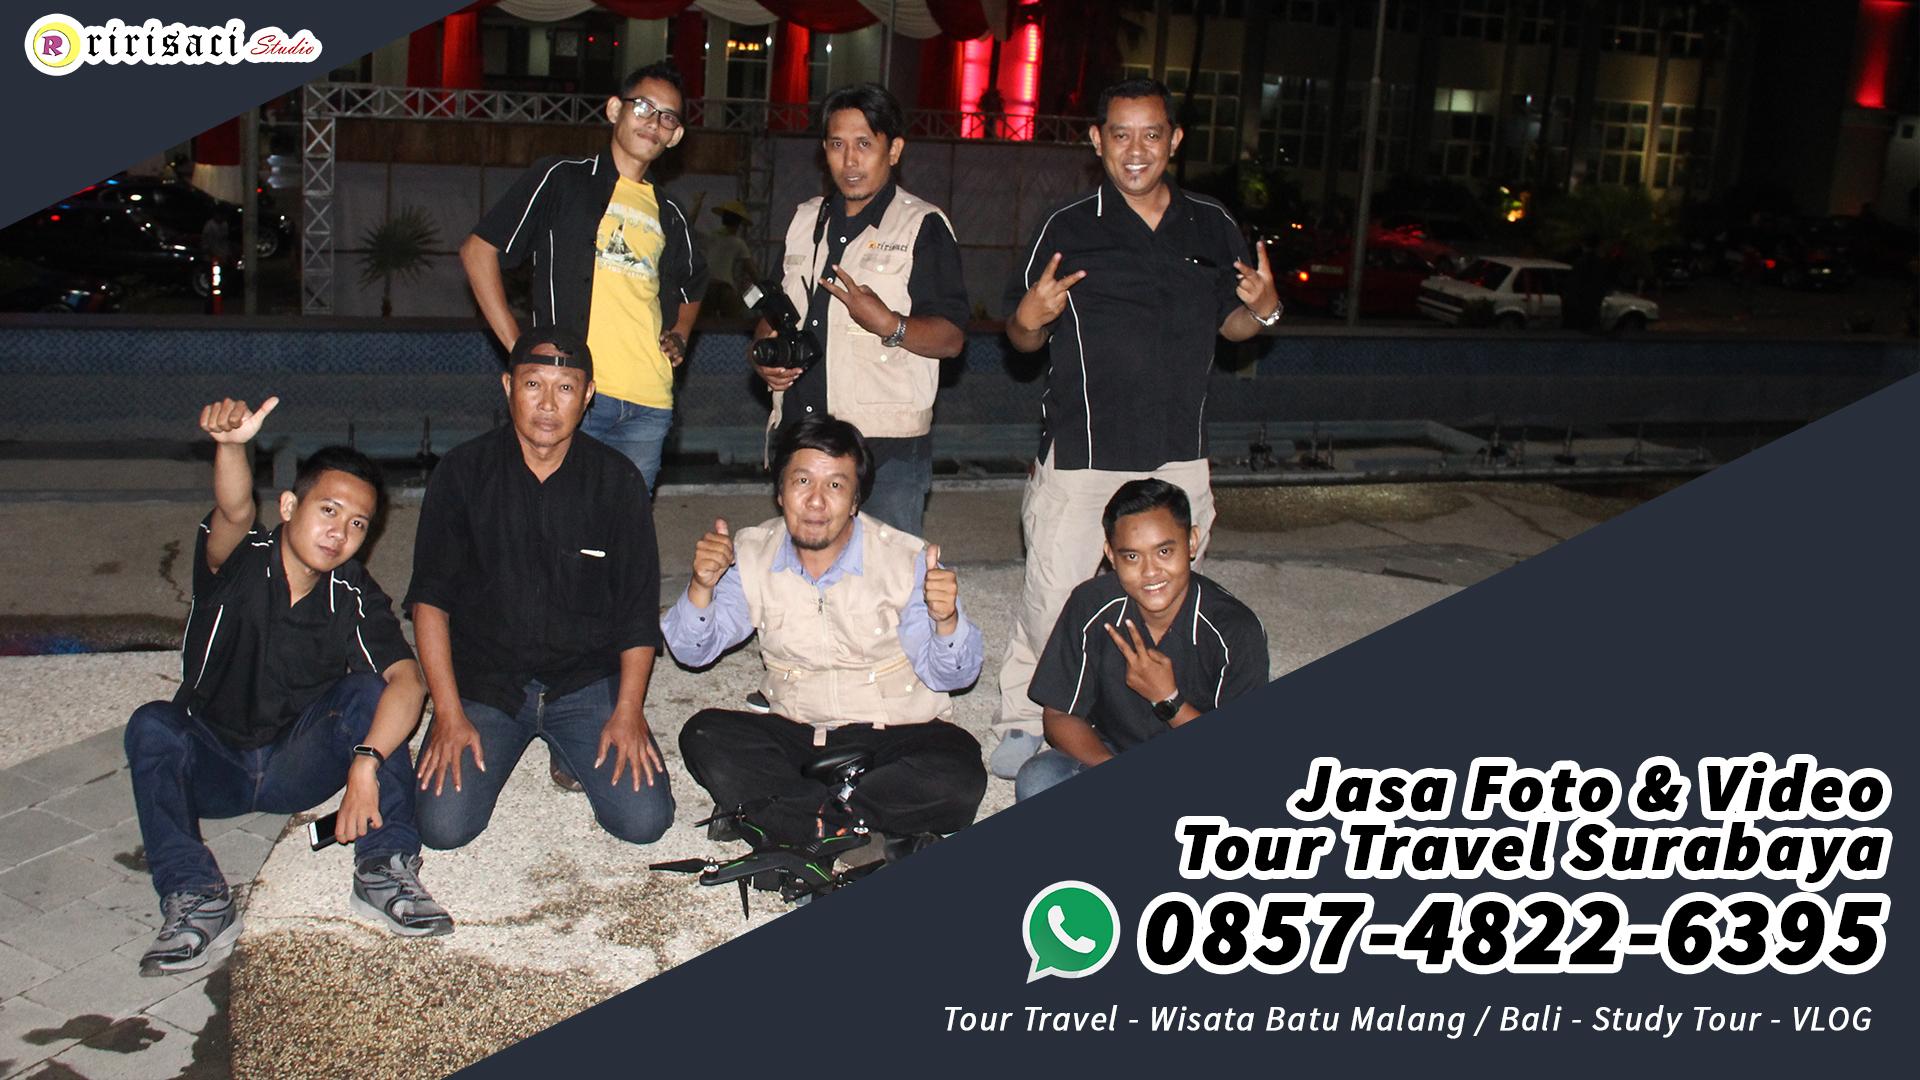 Jasa Dokumentasi Event Liburan – Jasa Video Shooting Travel. RIRISACI STUDIO : 085748226395